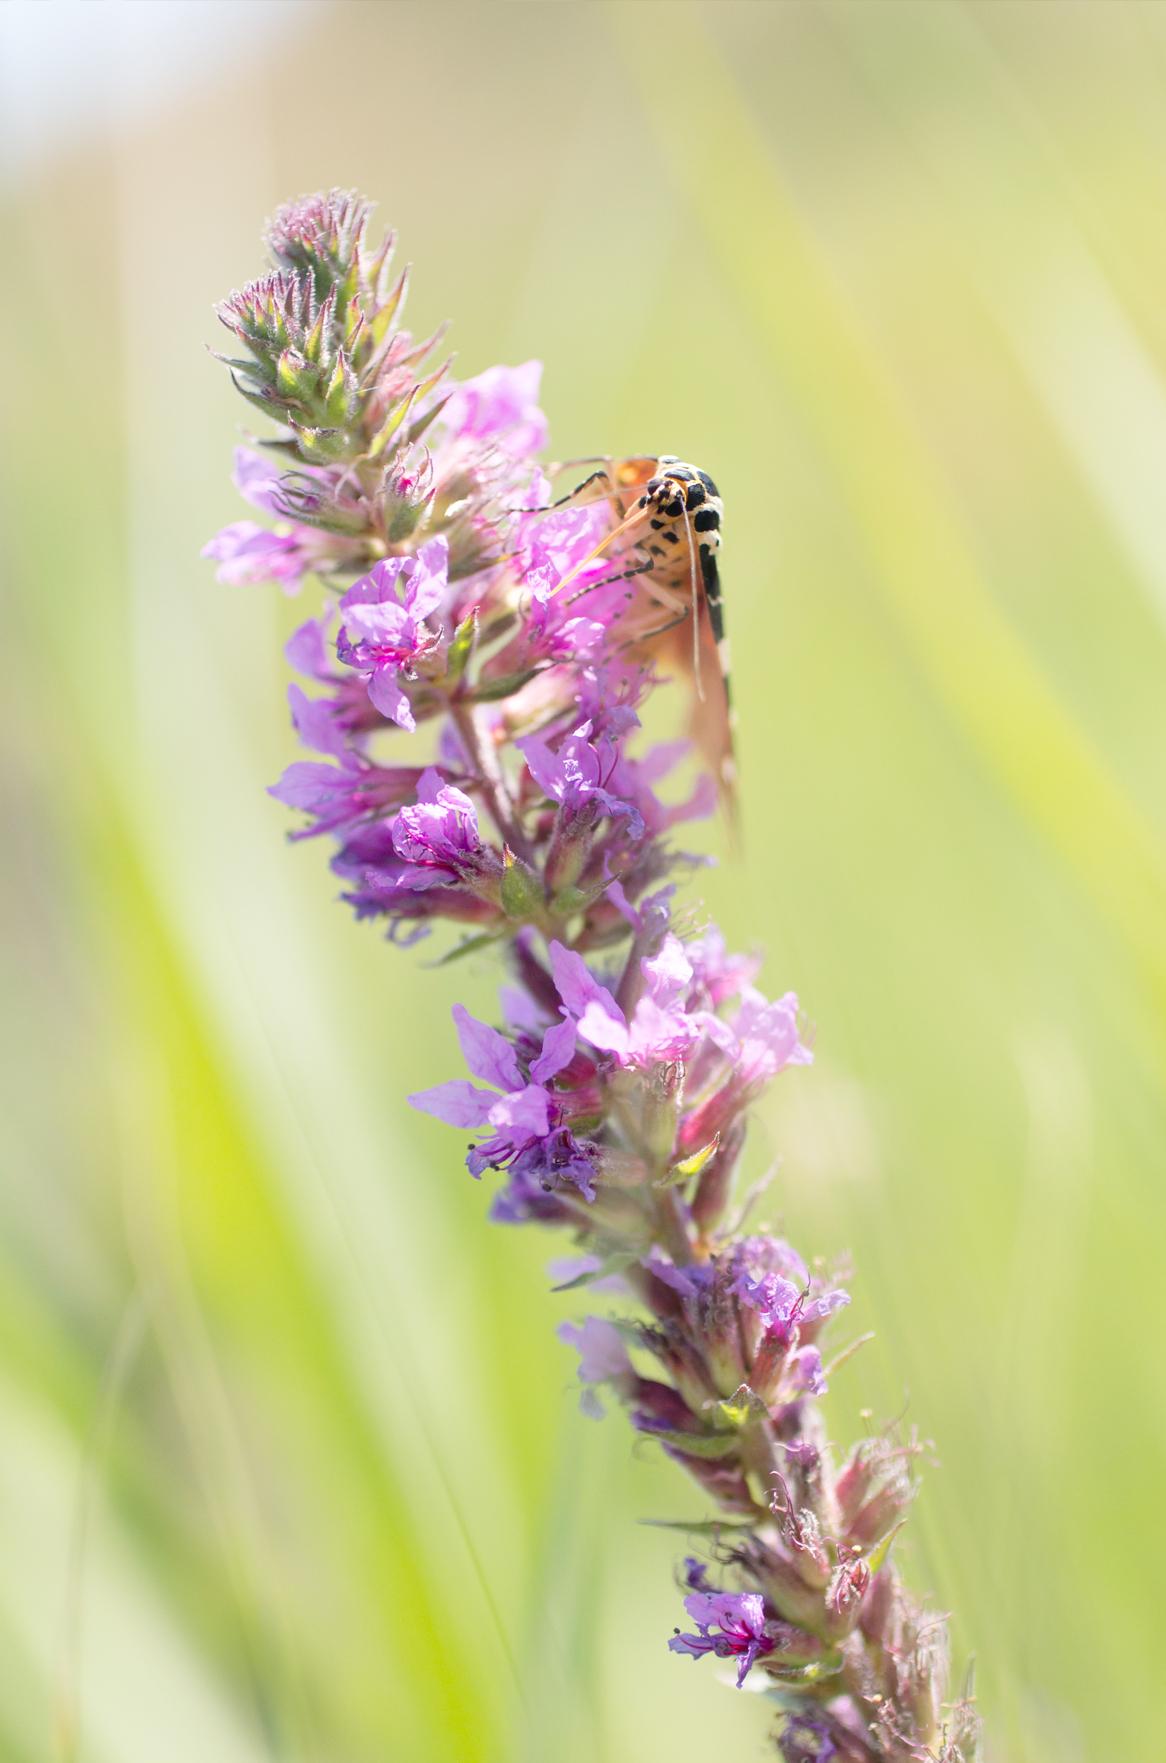 Moth on a wildlflower